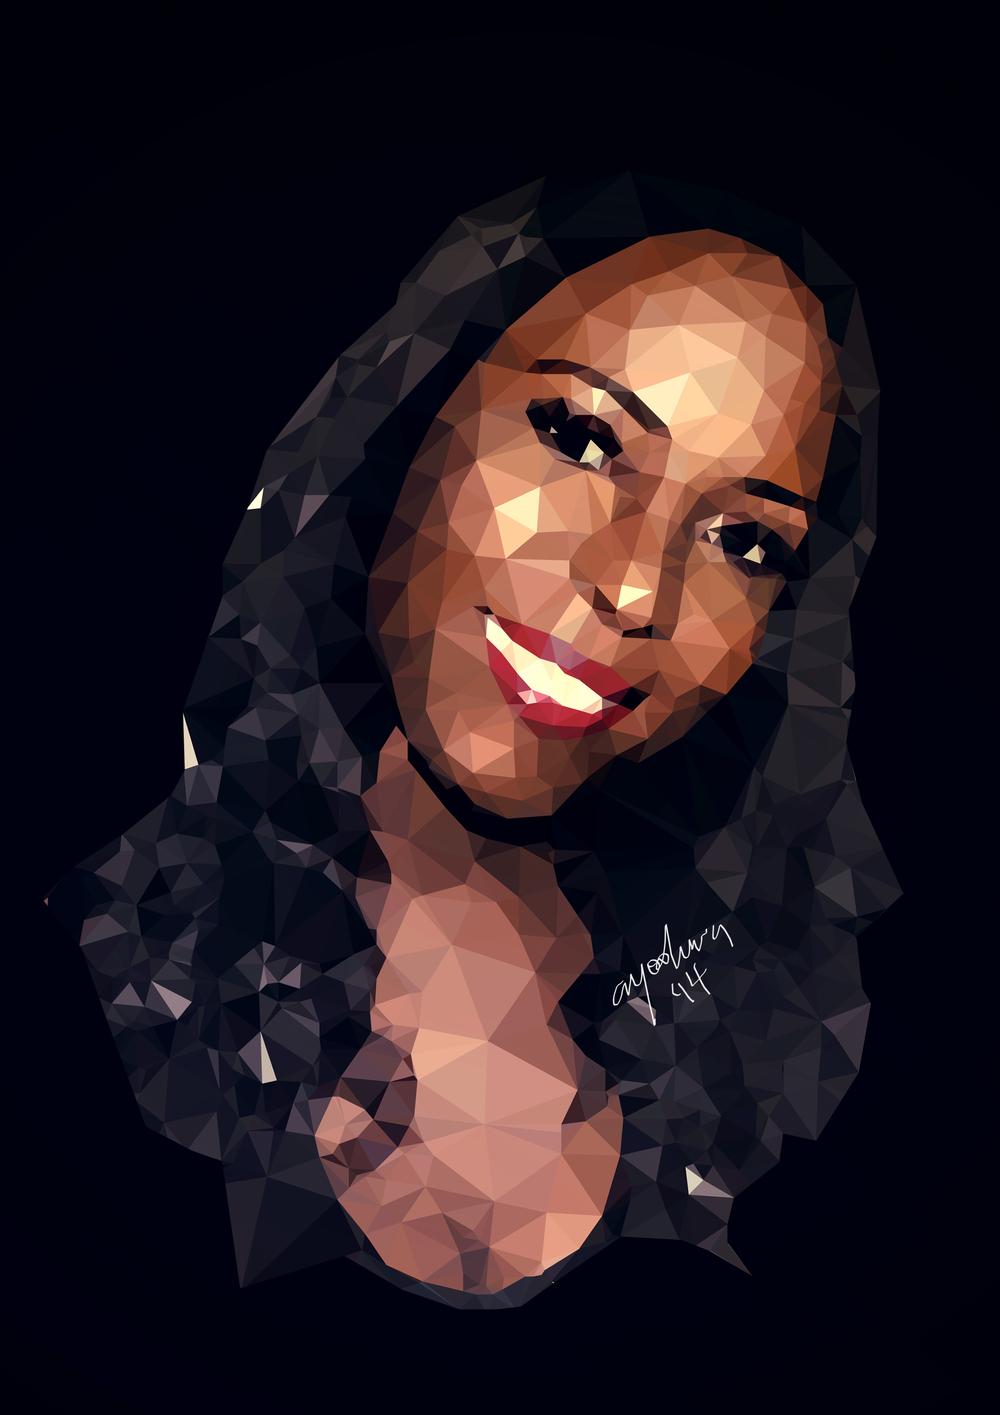 Linda Ikeji. Illustration, Ayooluwa Elisha